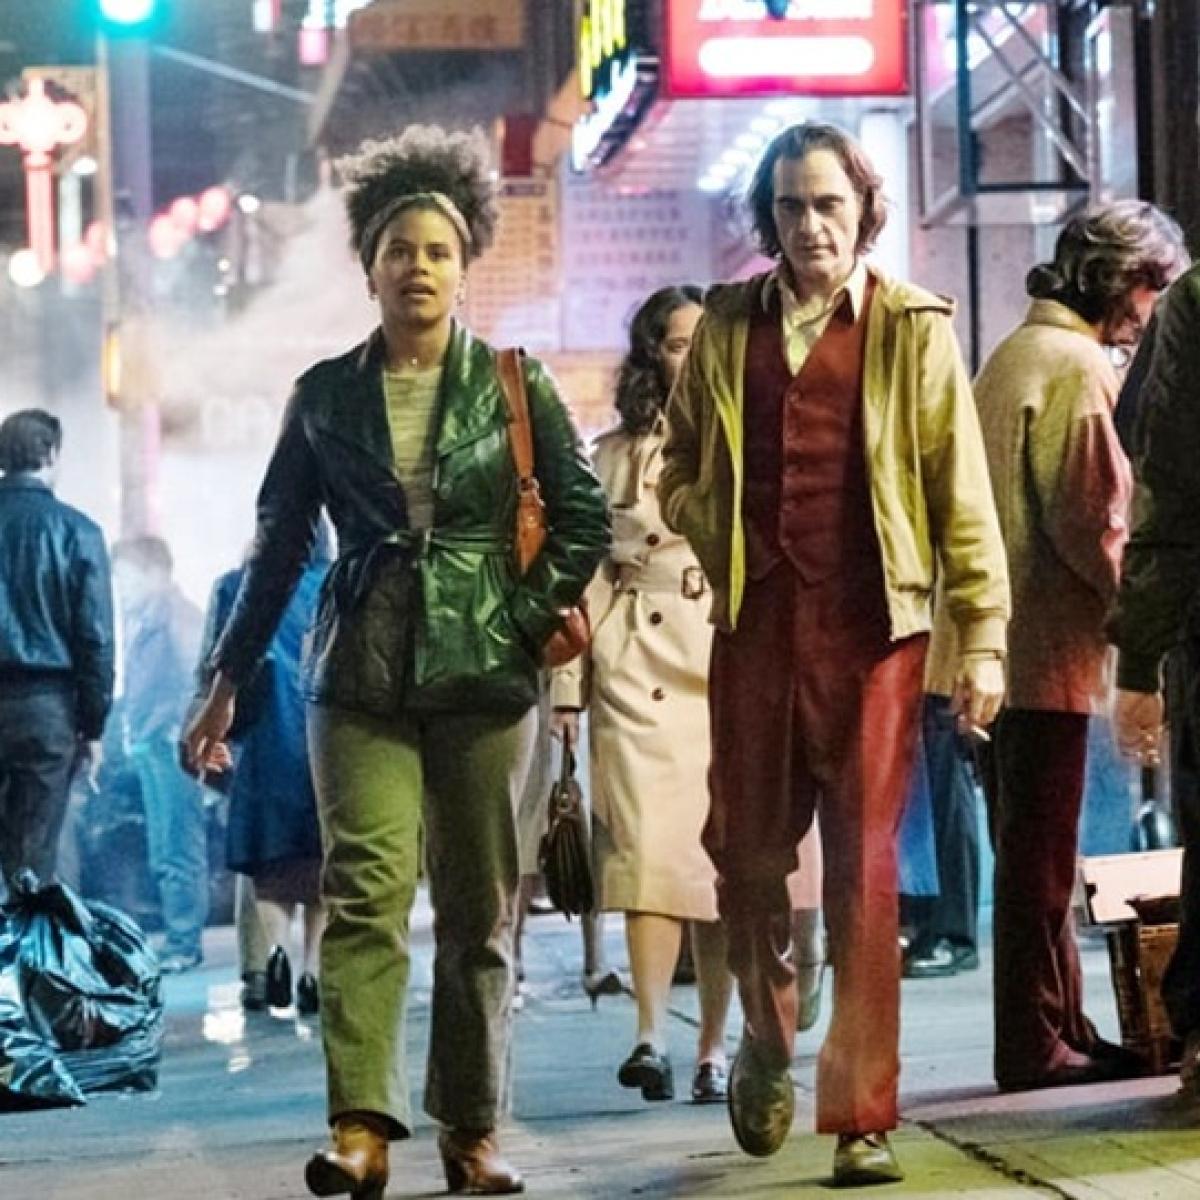 Joaquin Phoenix's Joker or Vidhushak:  Jester is the conscious keeper of humanity